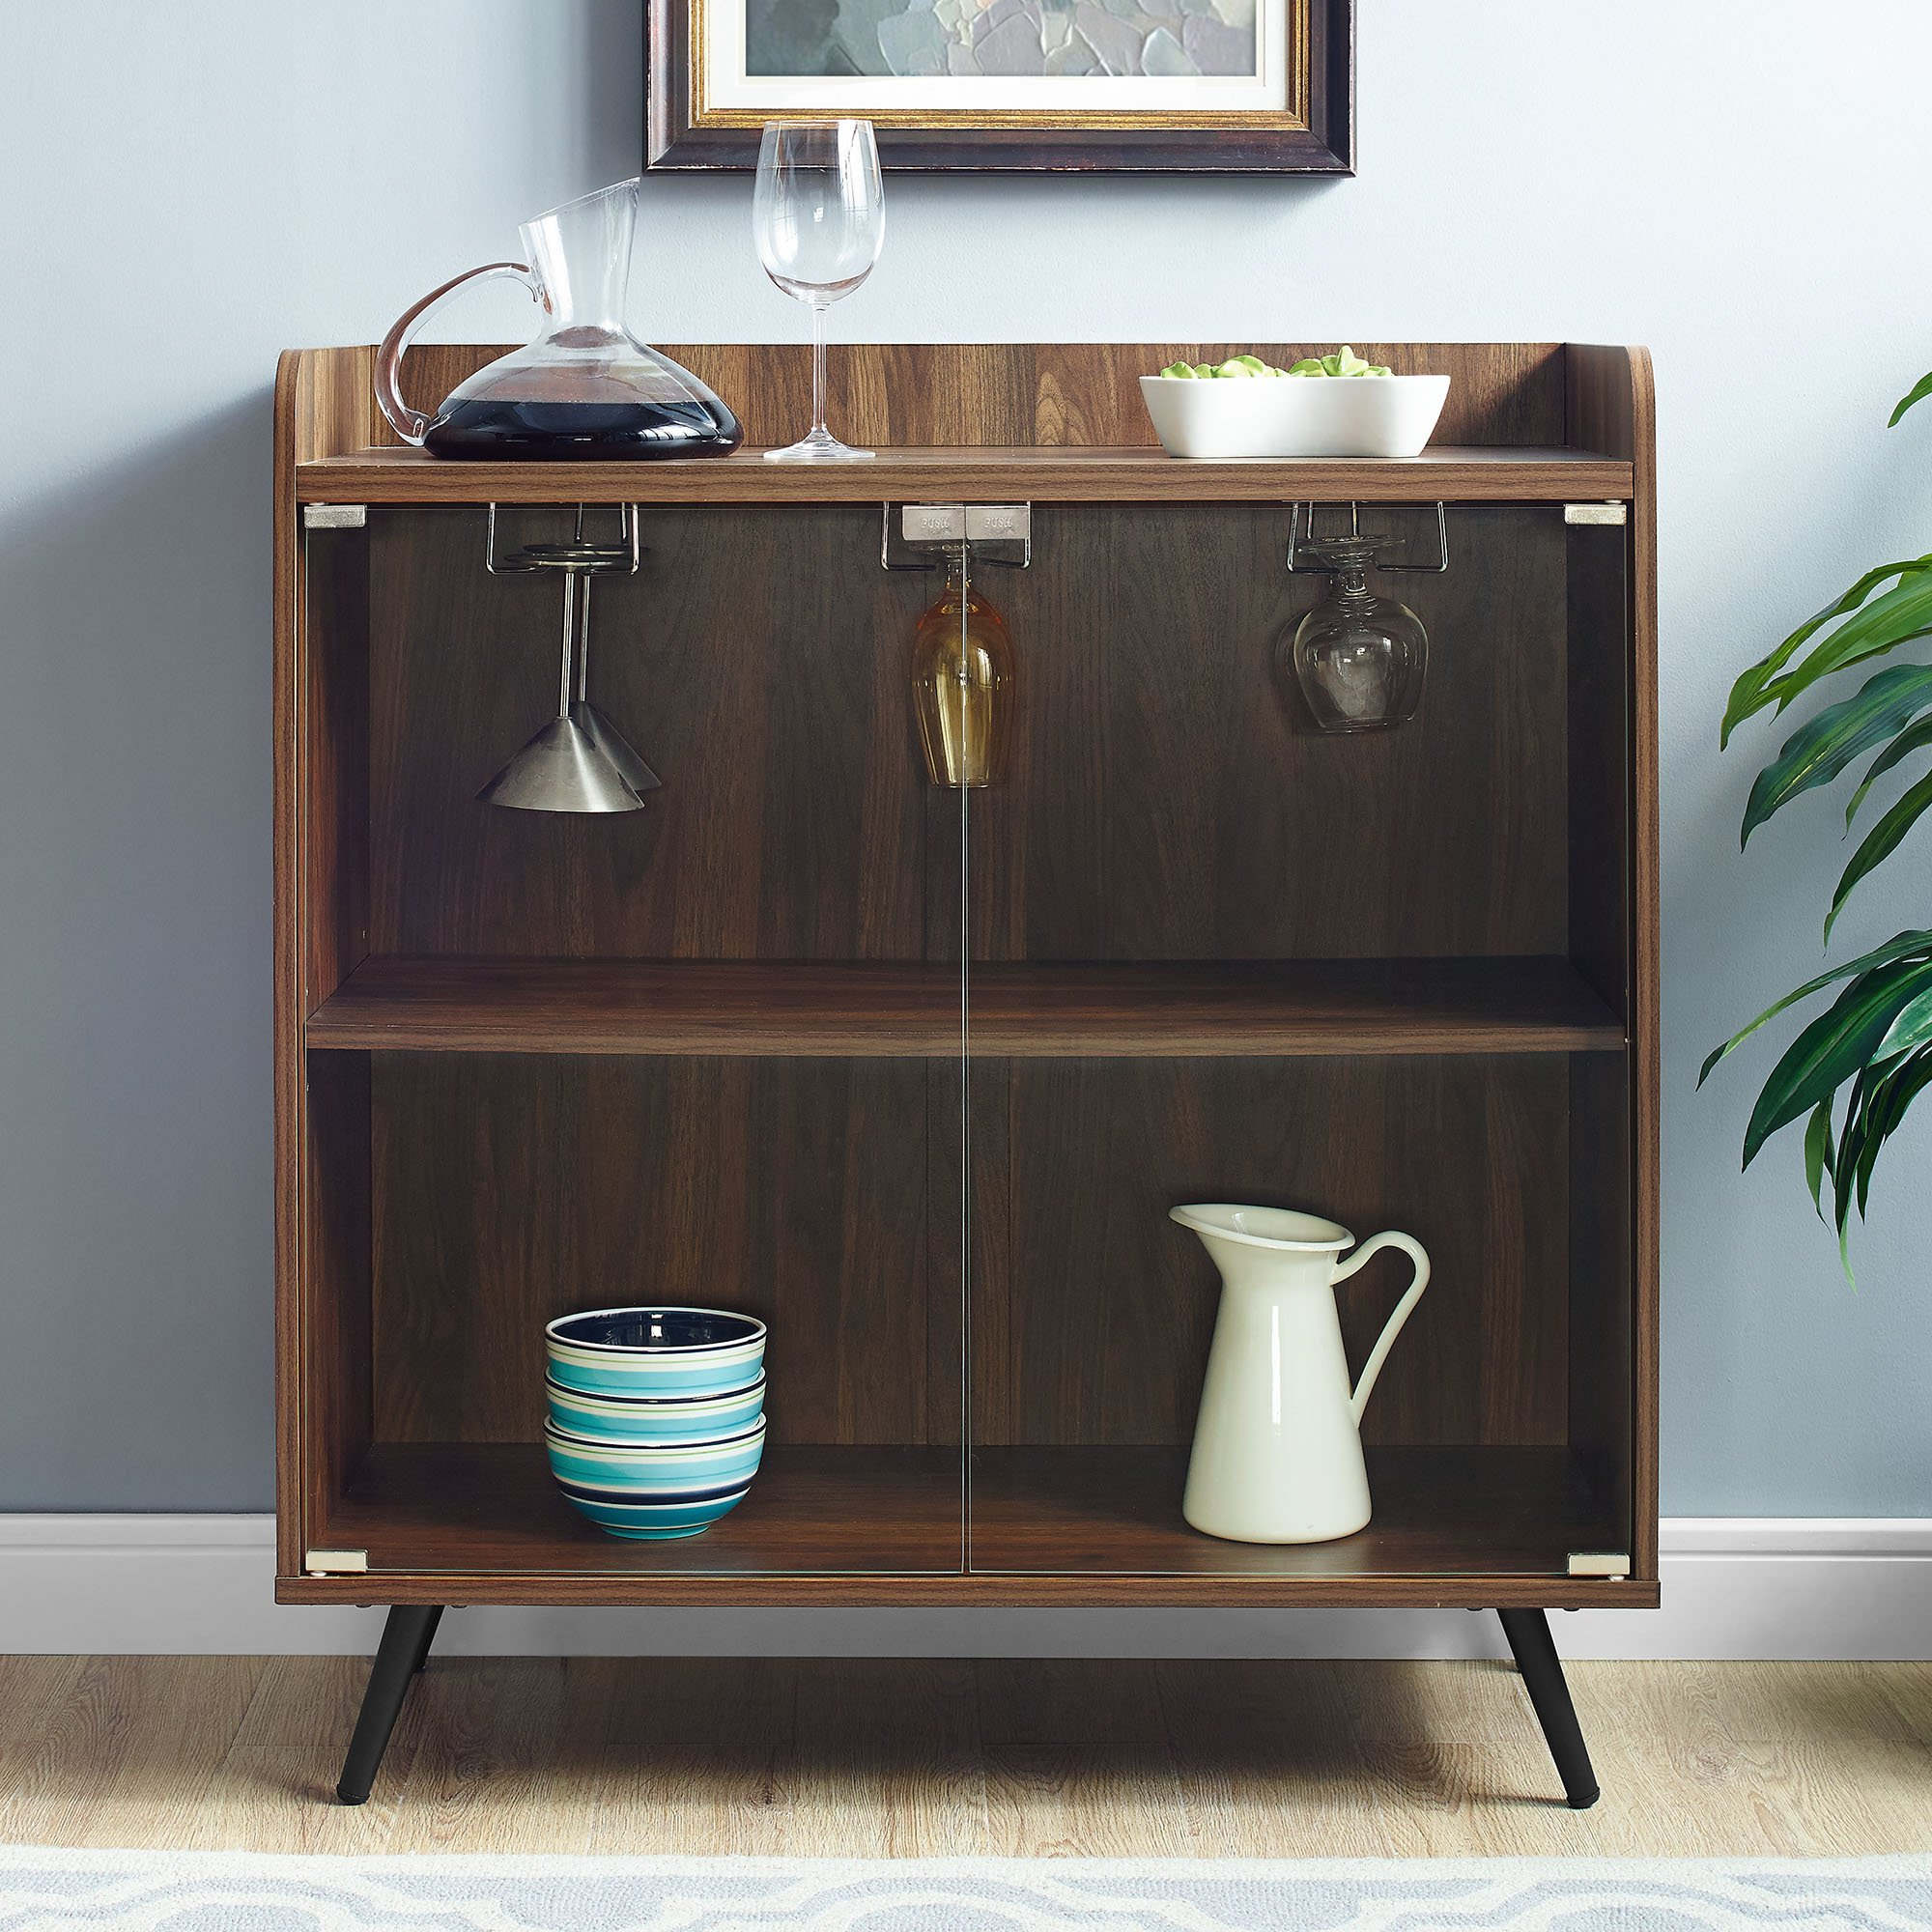 WE Furniture Bar Cabinet w/Storage & Stemware Rack, 38'' H x 16'' W x 30'' L, Dark Walnut by WE Furniture